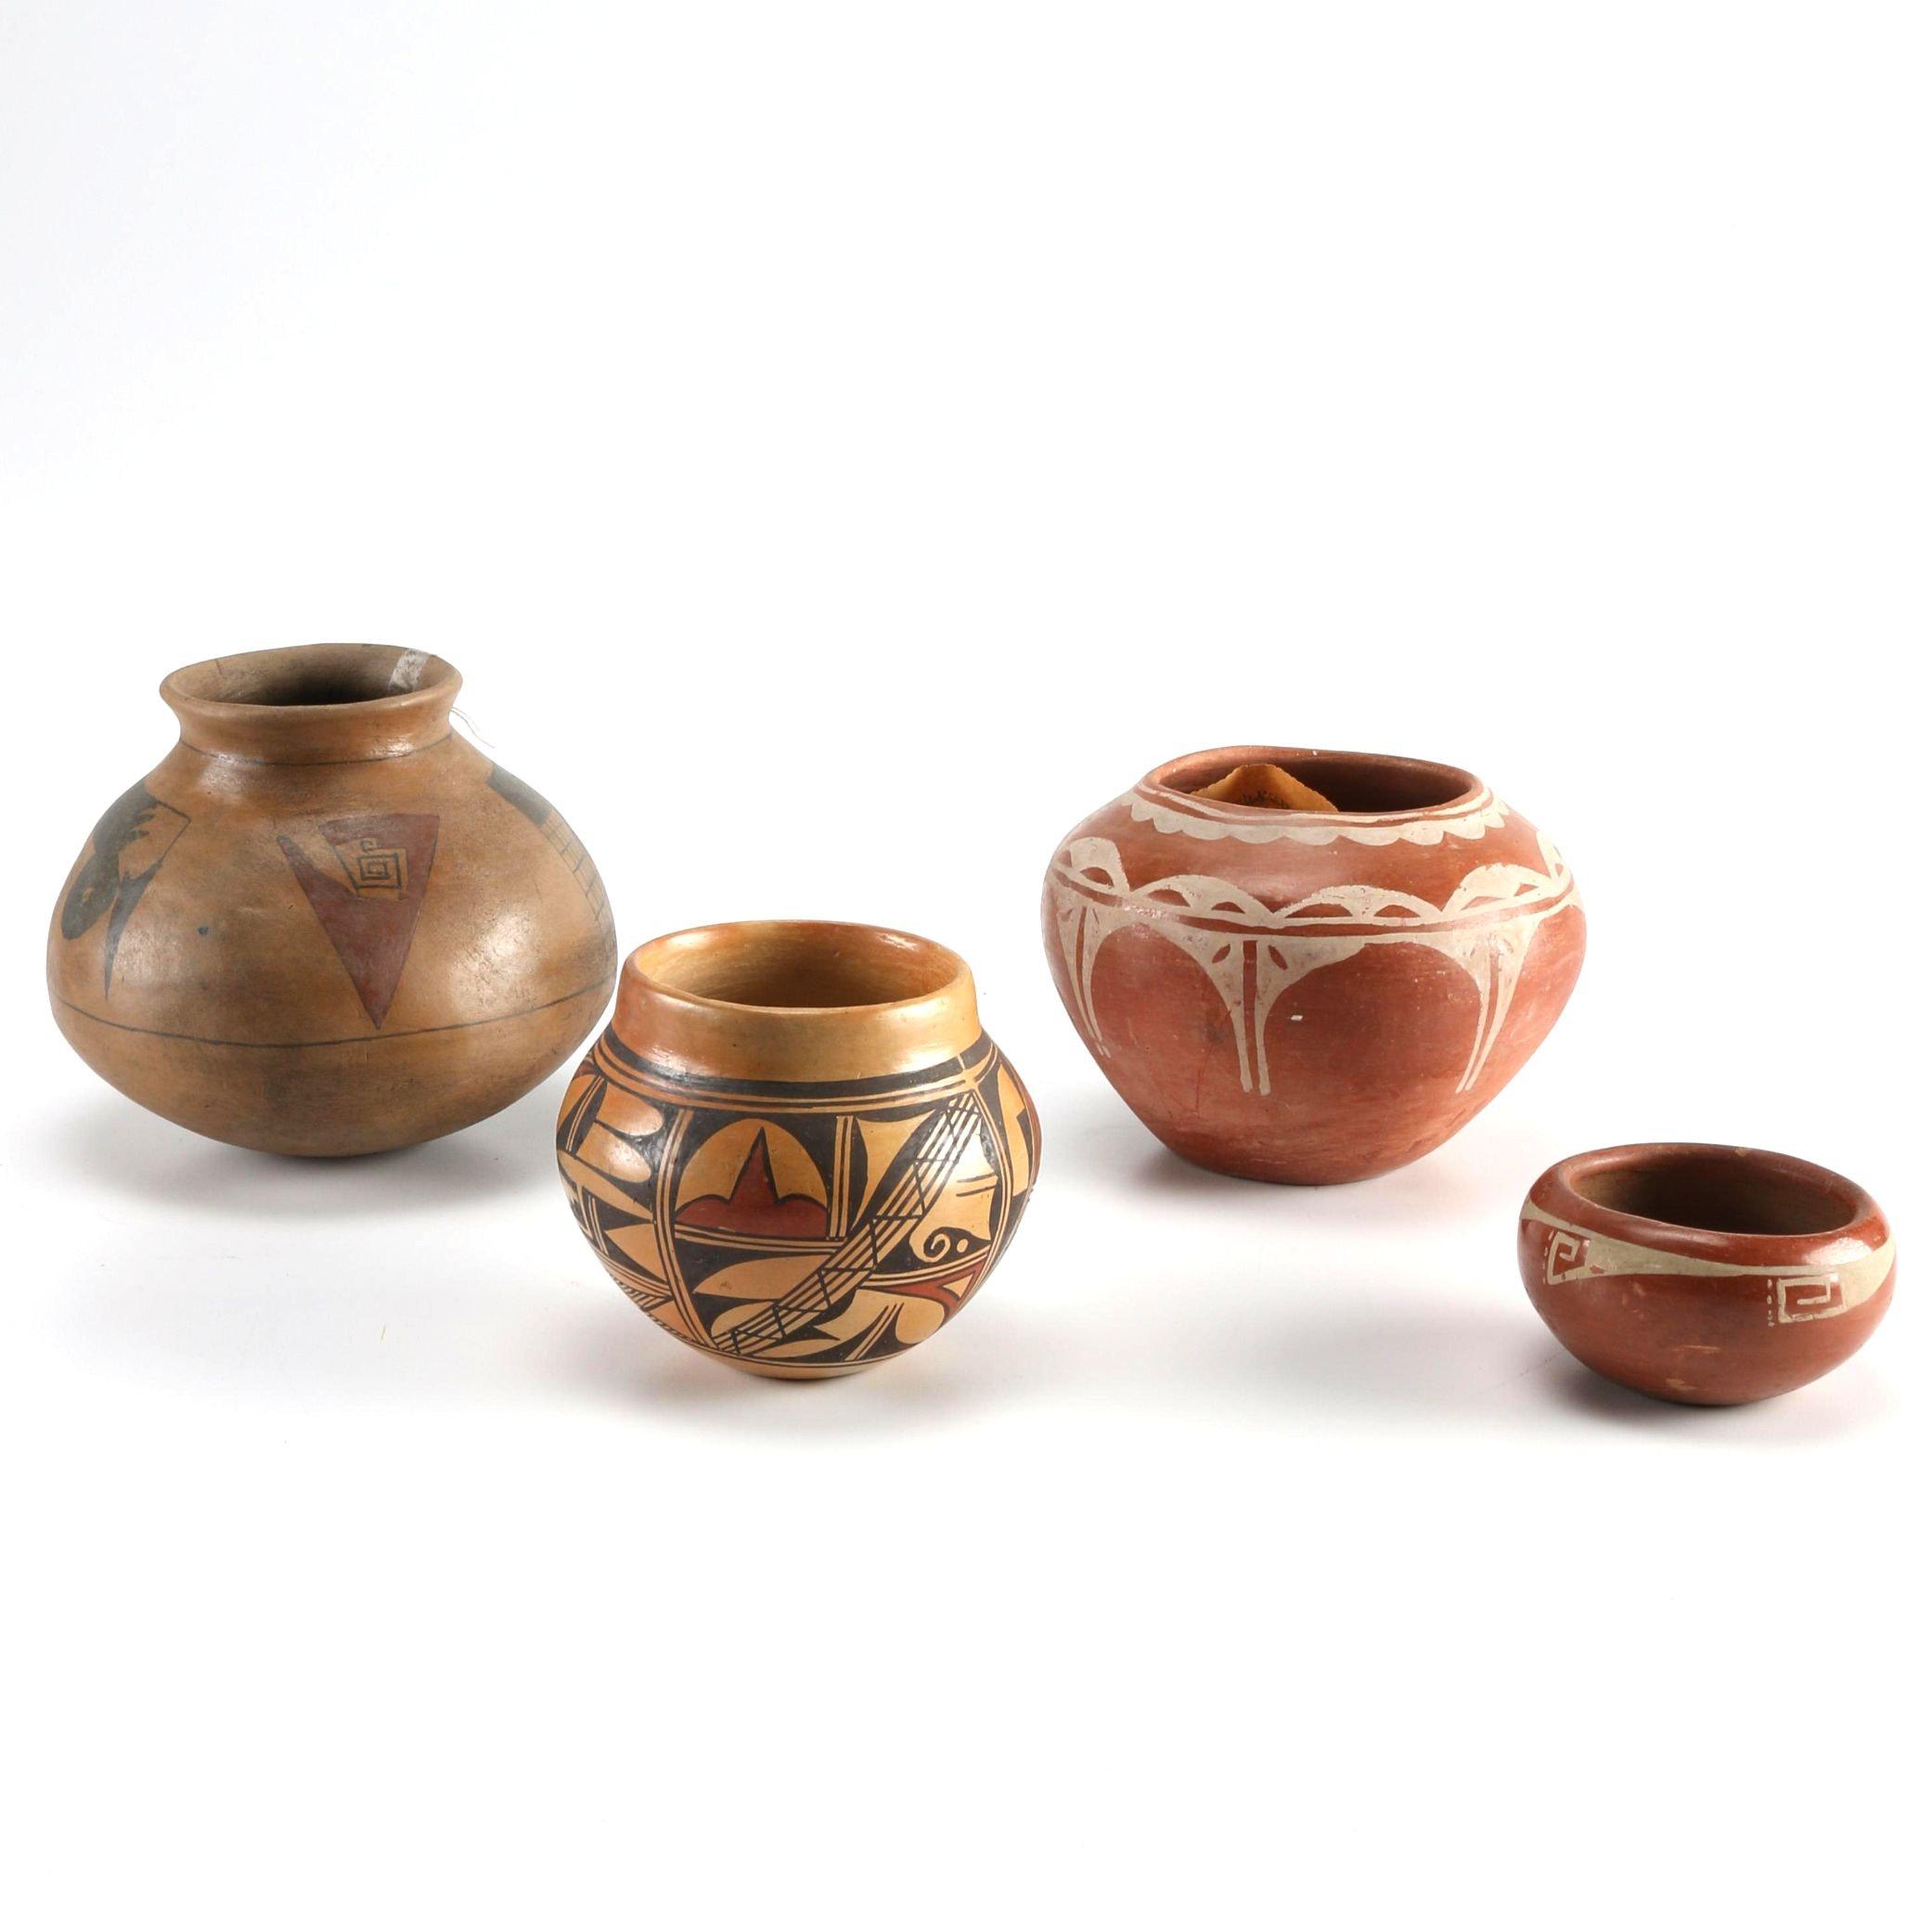 Olive Toney Hopi Bowl and Pueblo Style Pottery